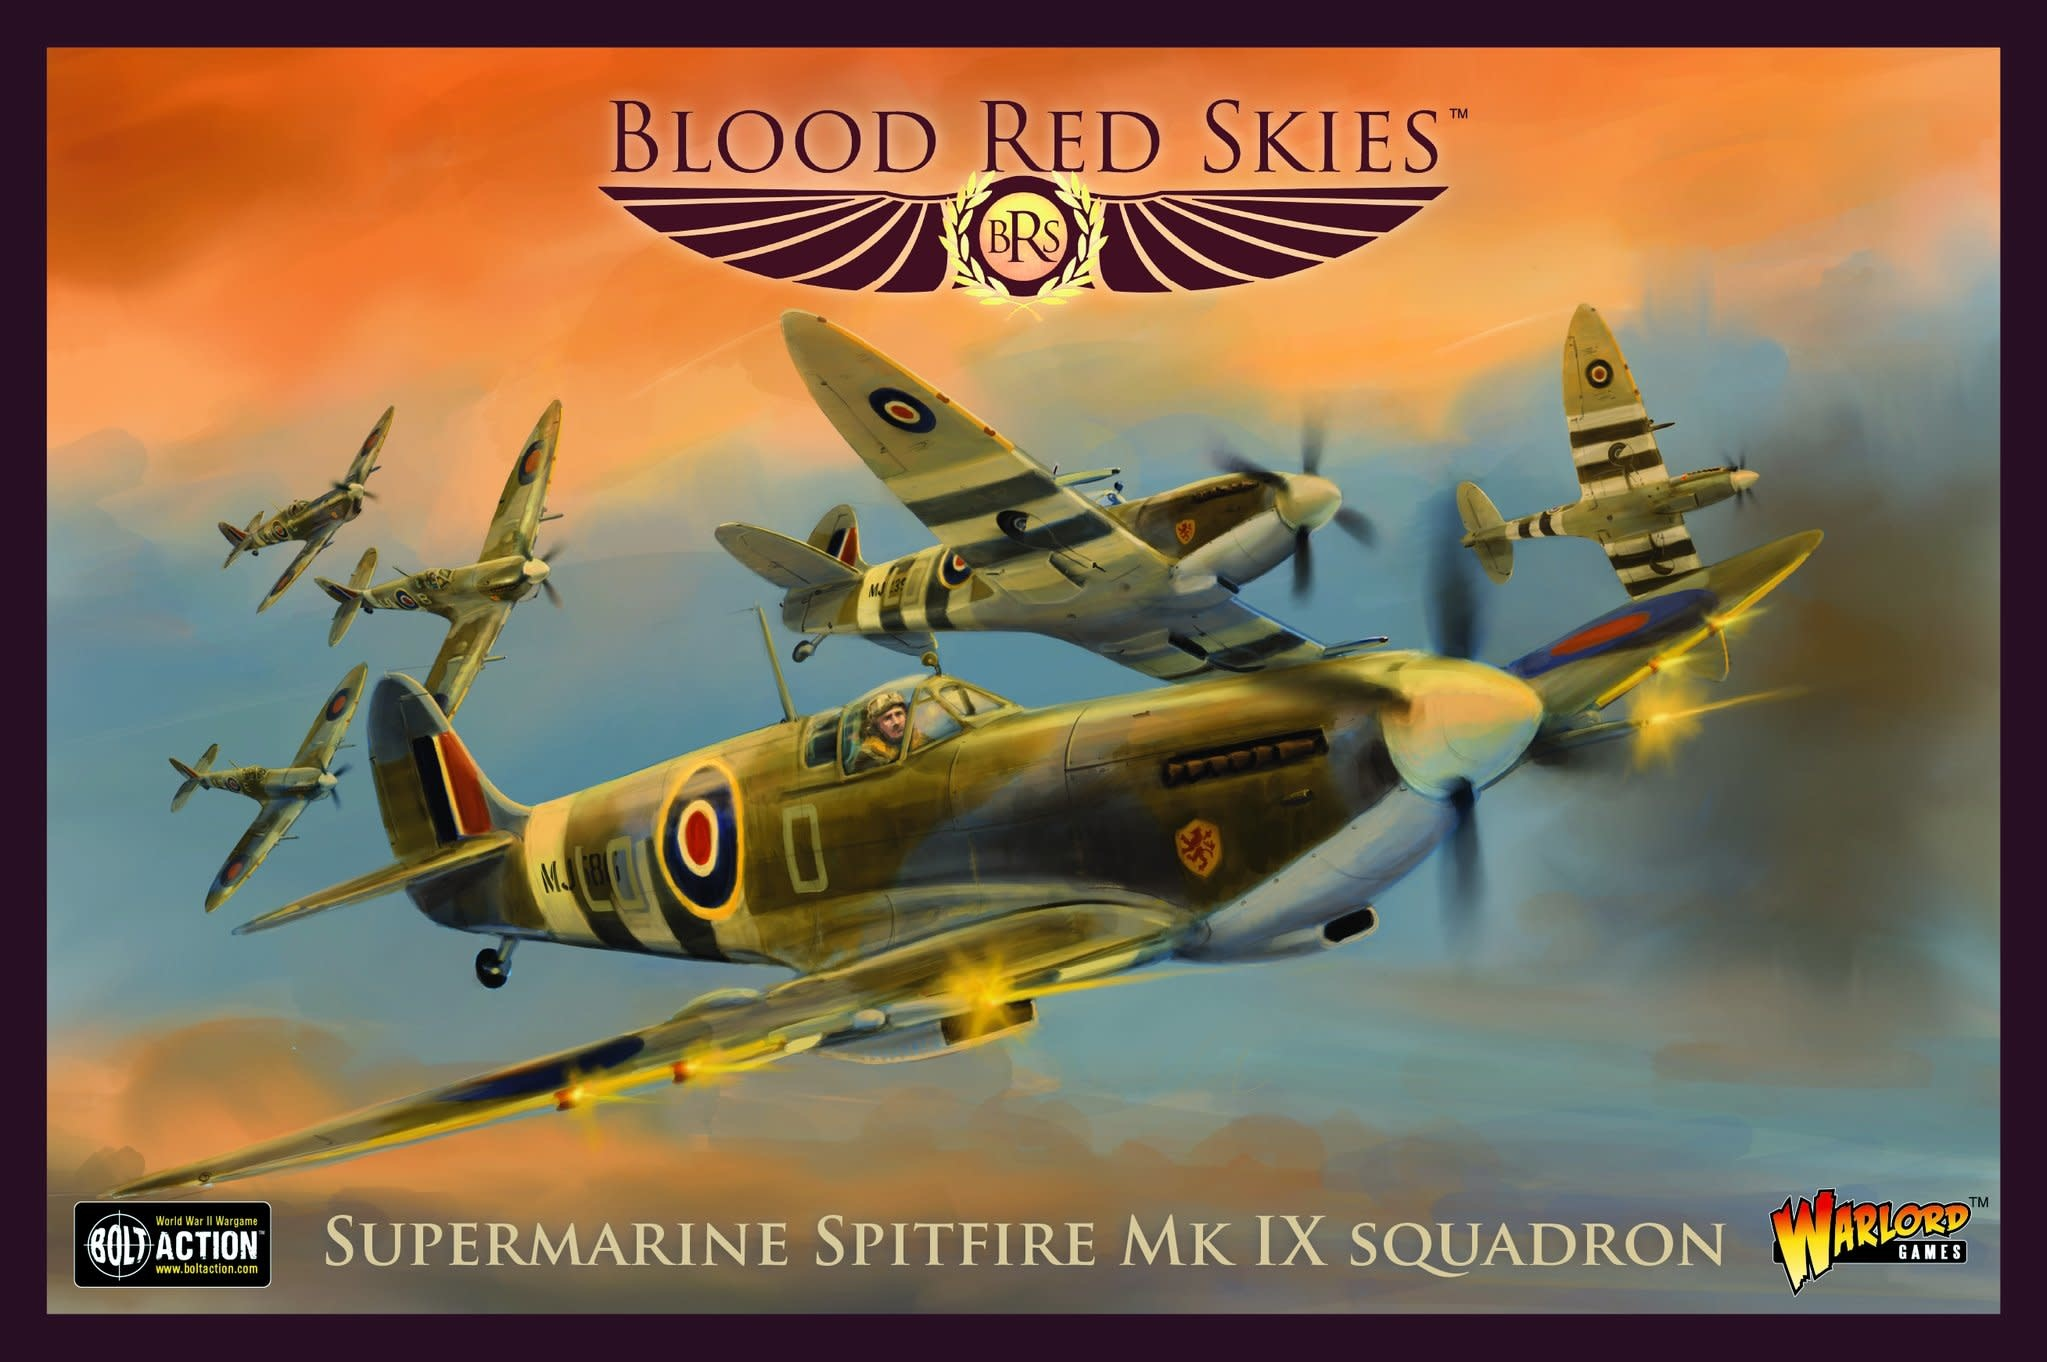 Warlord games Blood Red Skies: Supermarine Spitfire Mk. IX Squadron